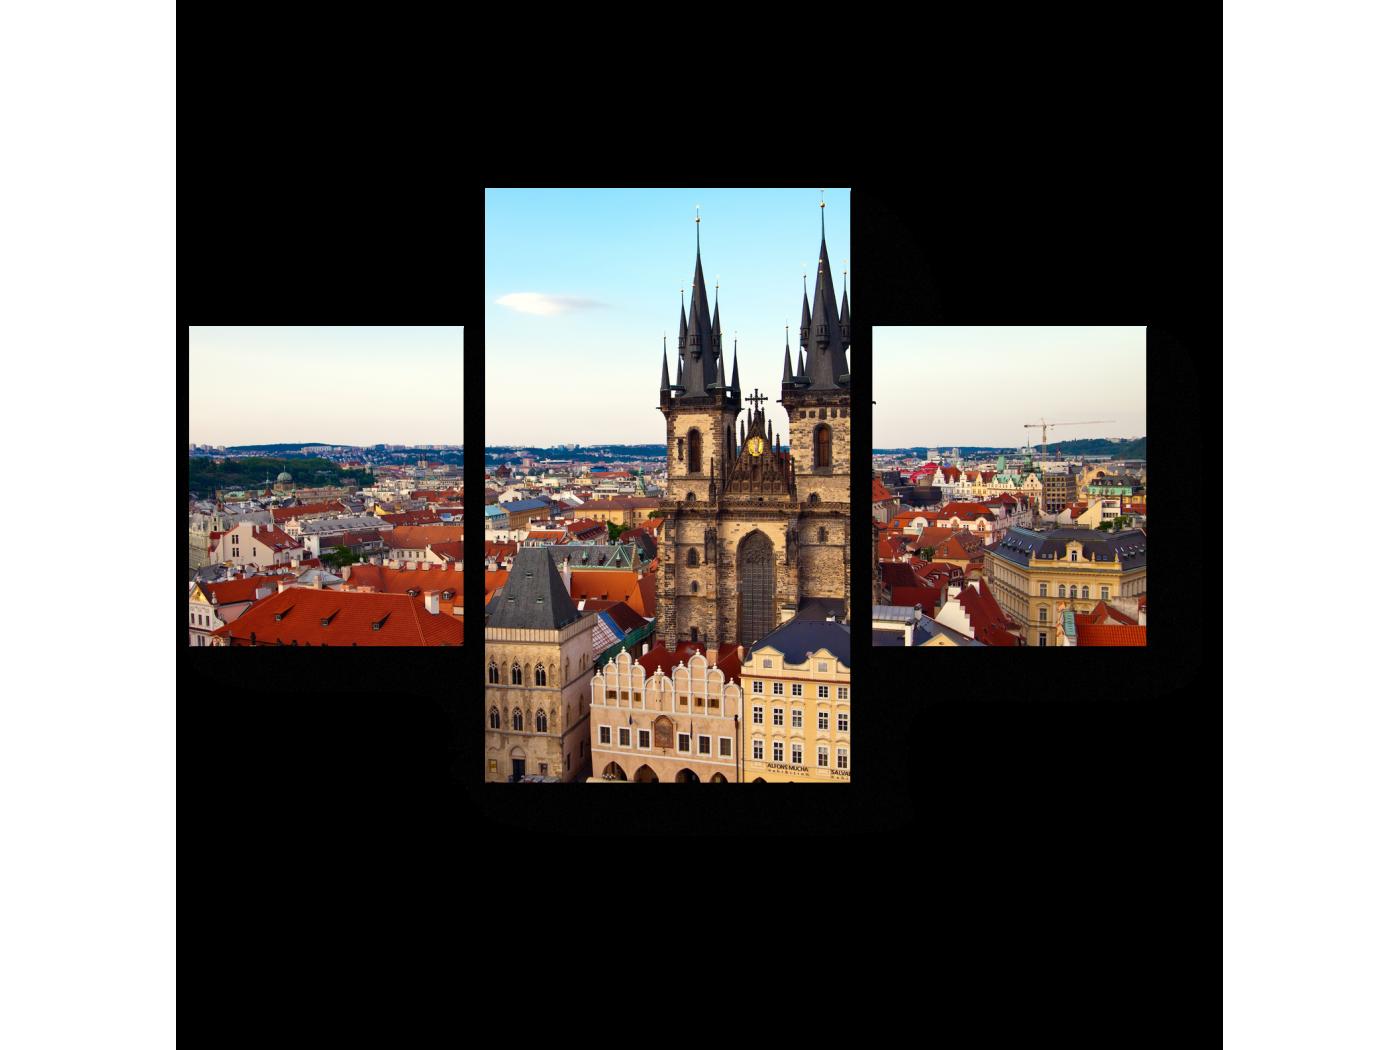 Модульная картина Красота Праги (80x52) фото